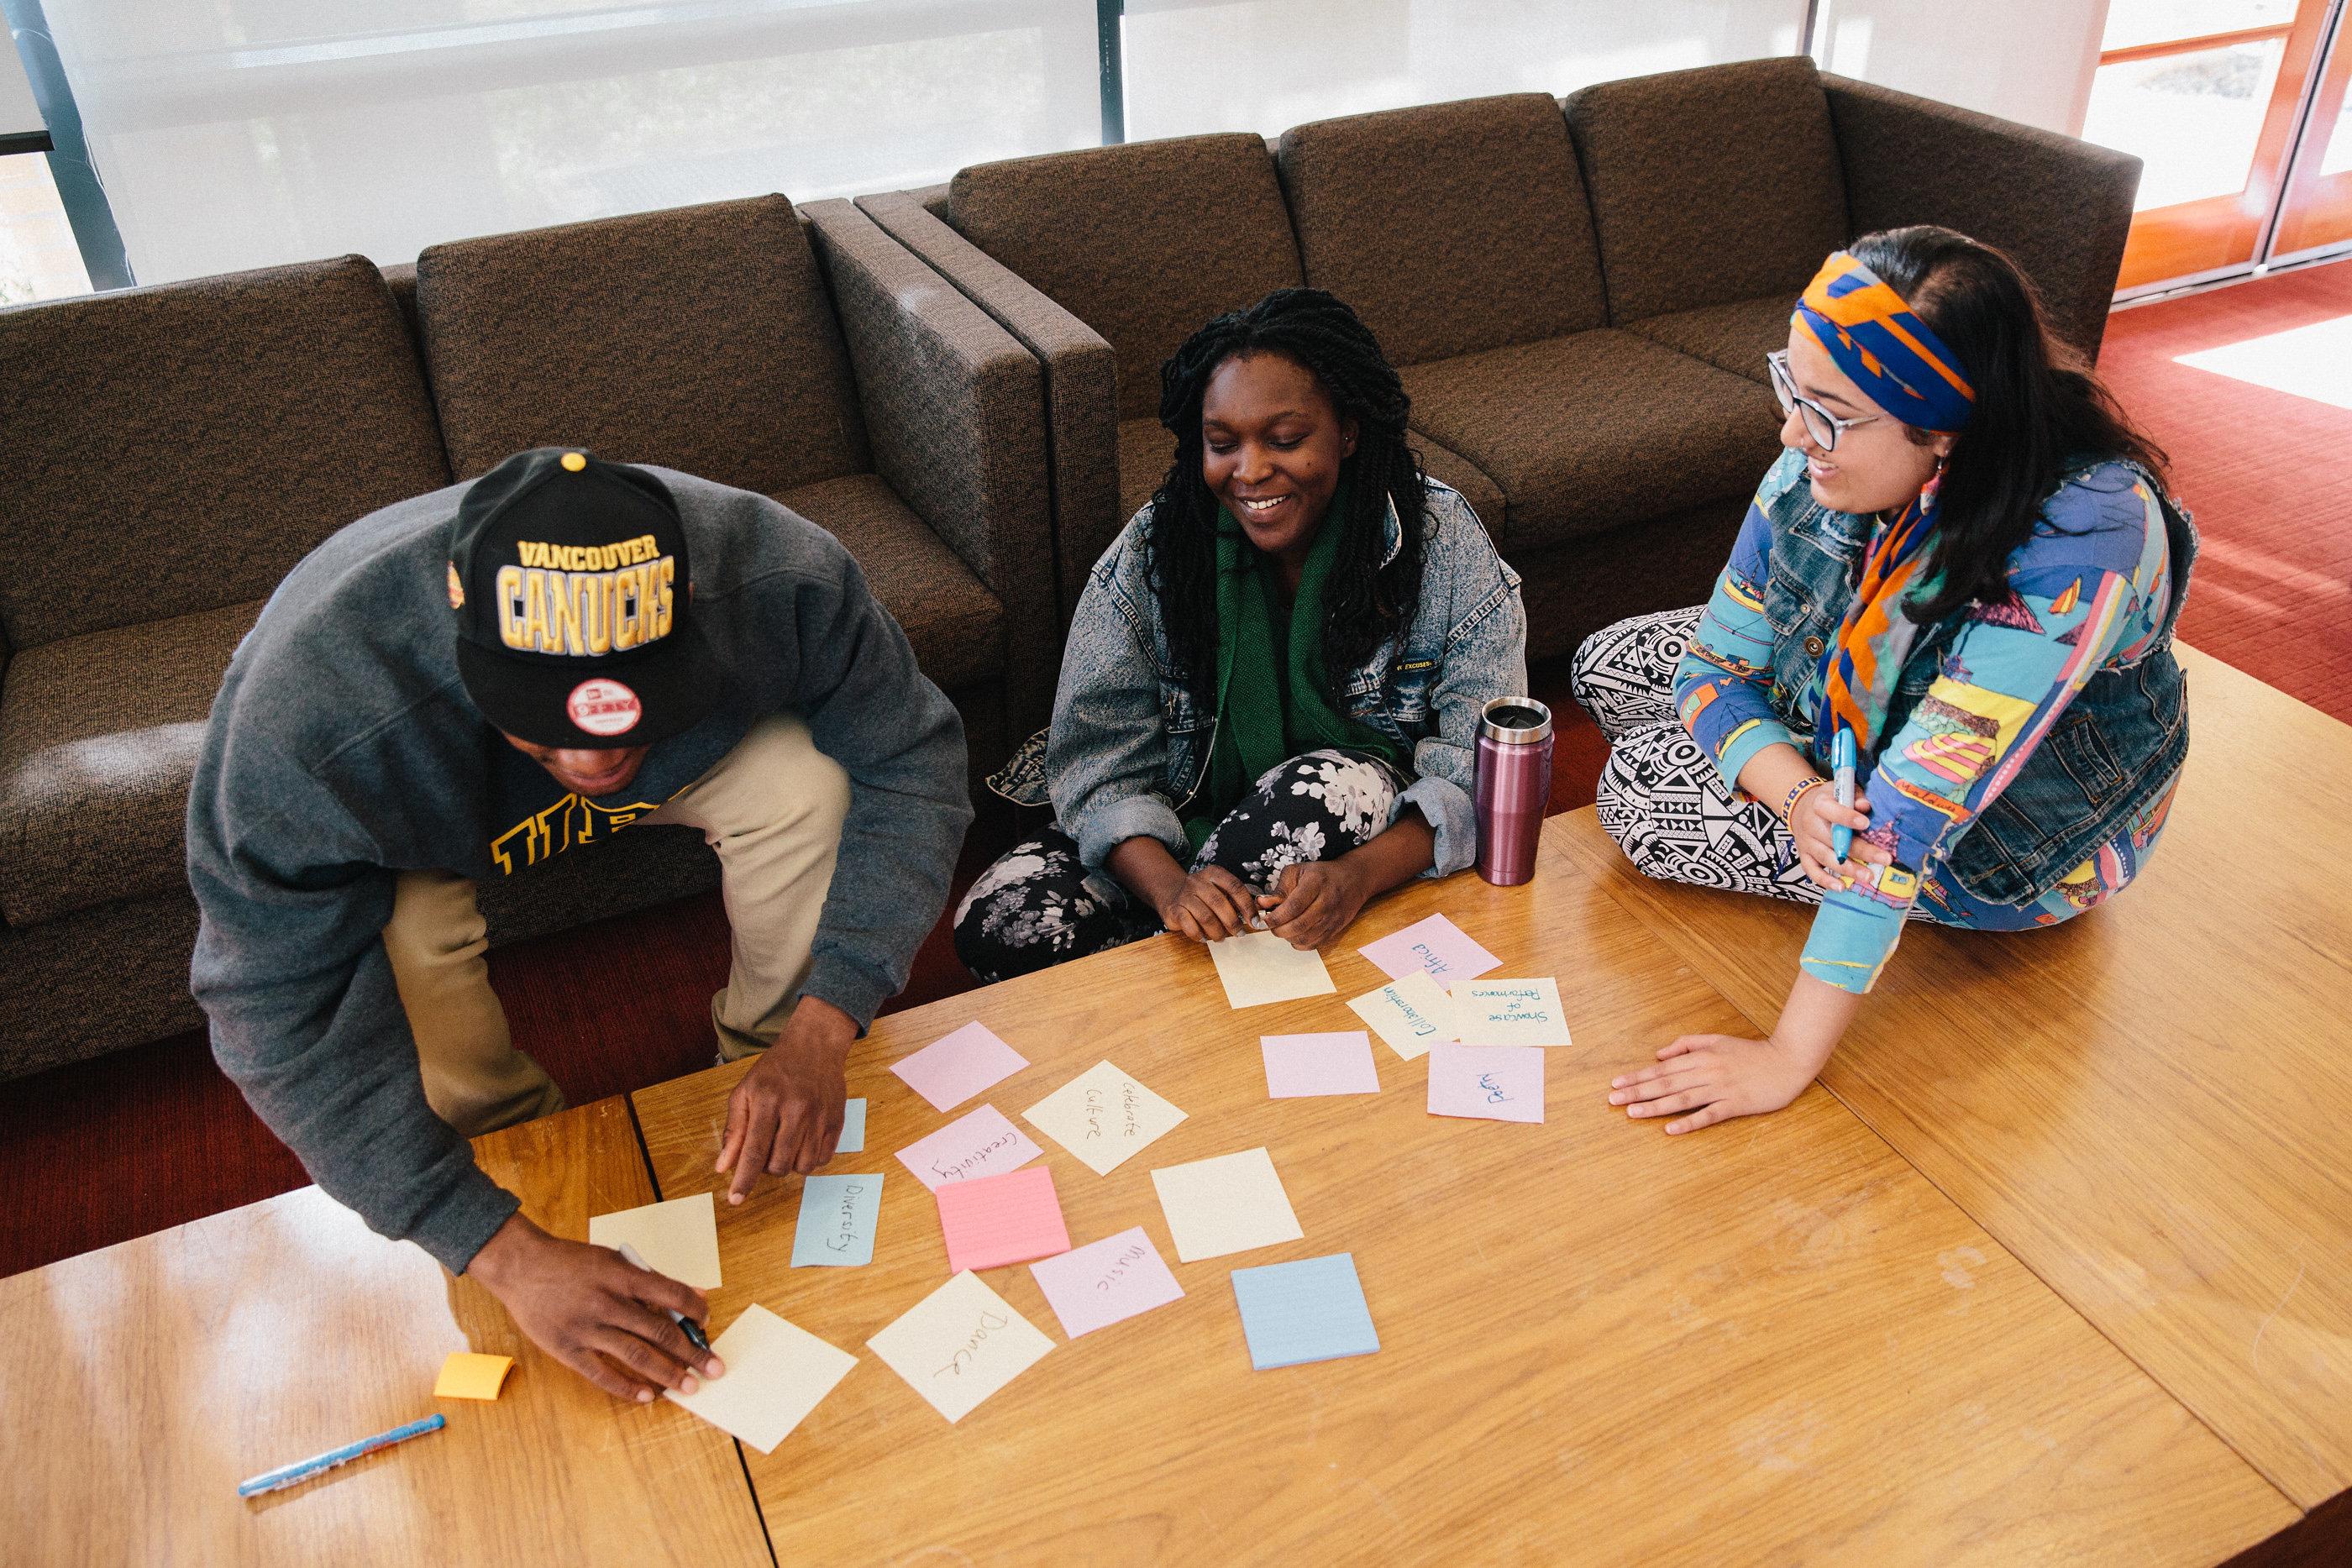 Creating community and a sense of belonging at UBC ...